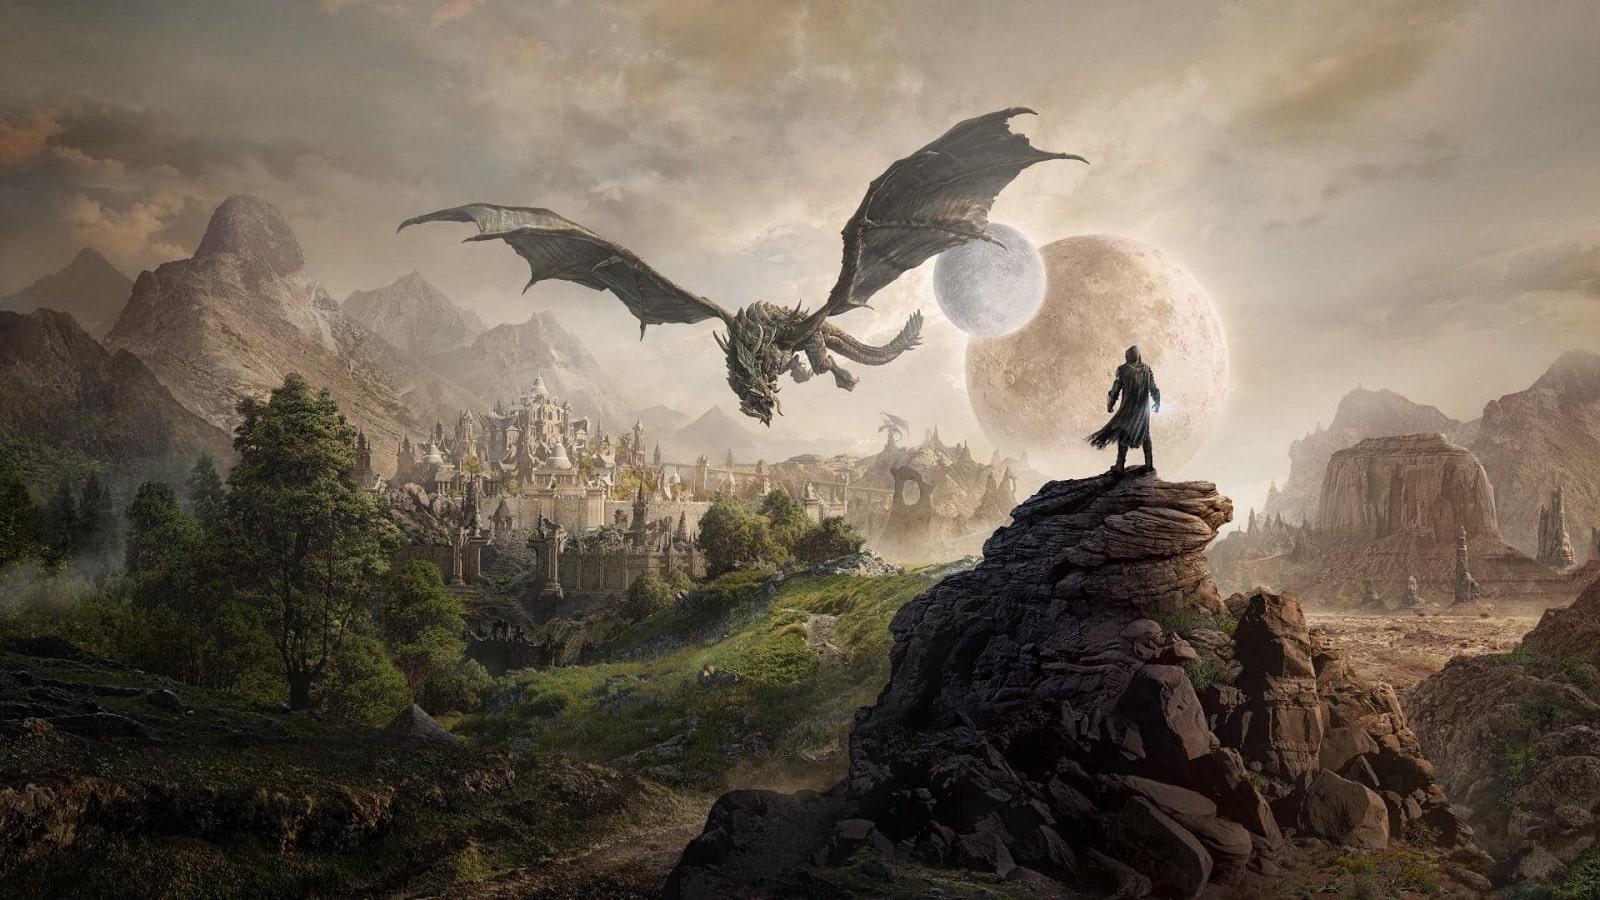 elder scrolls online elseweyr expansion with dragons